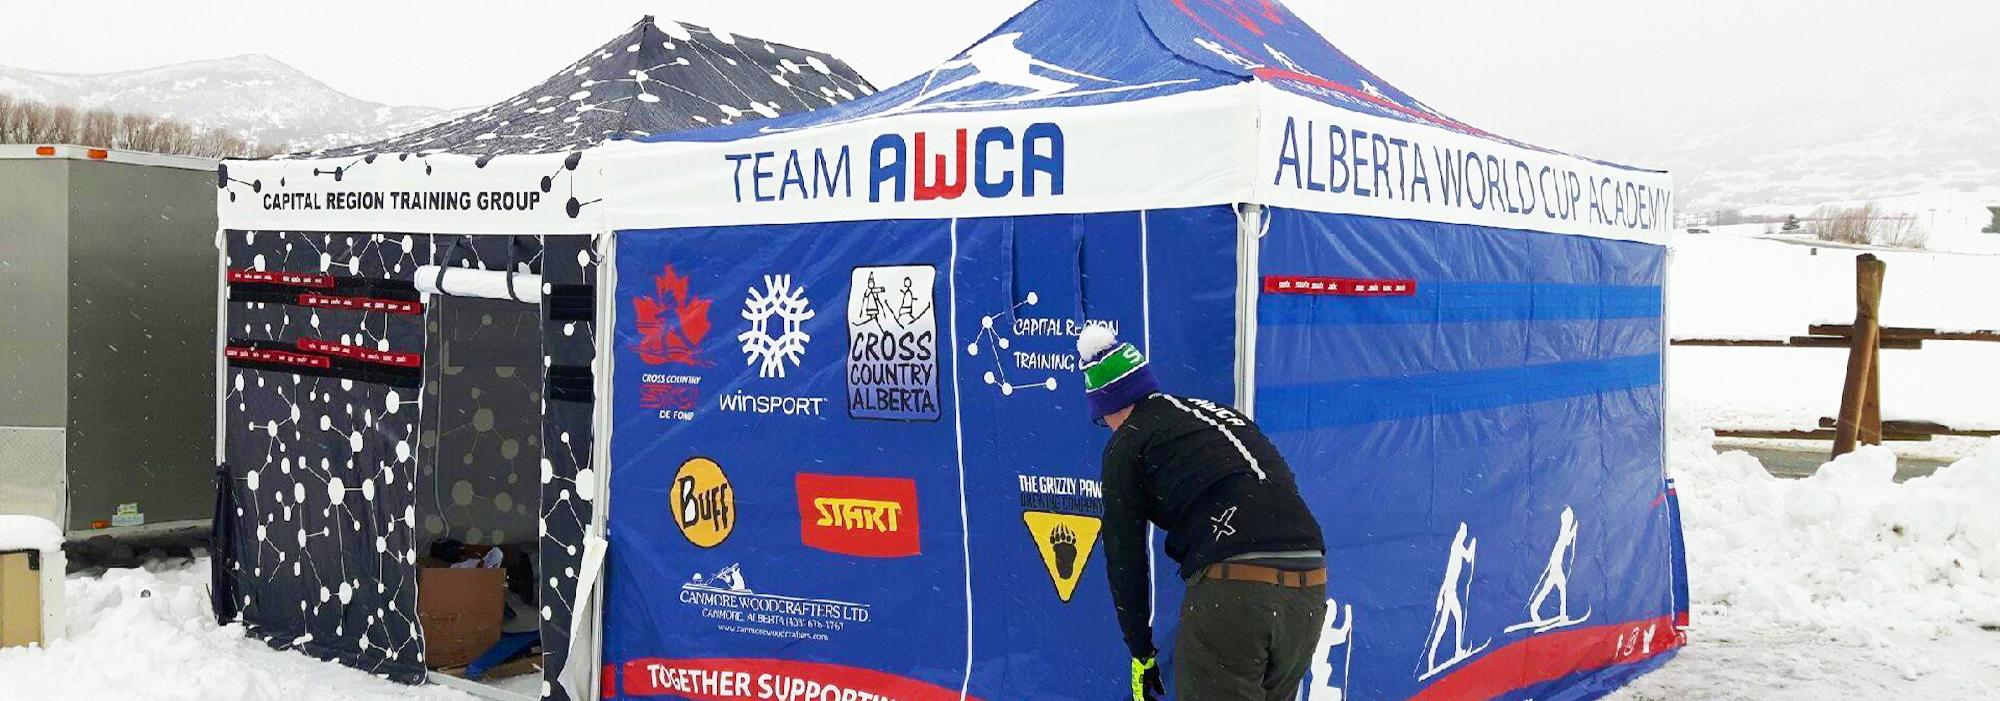 Alberta World Cup Sponsors